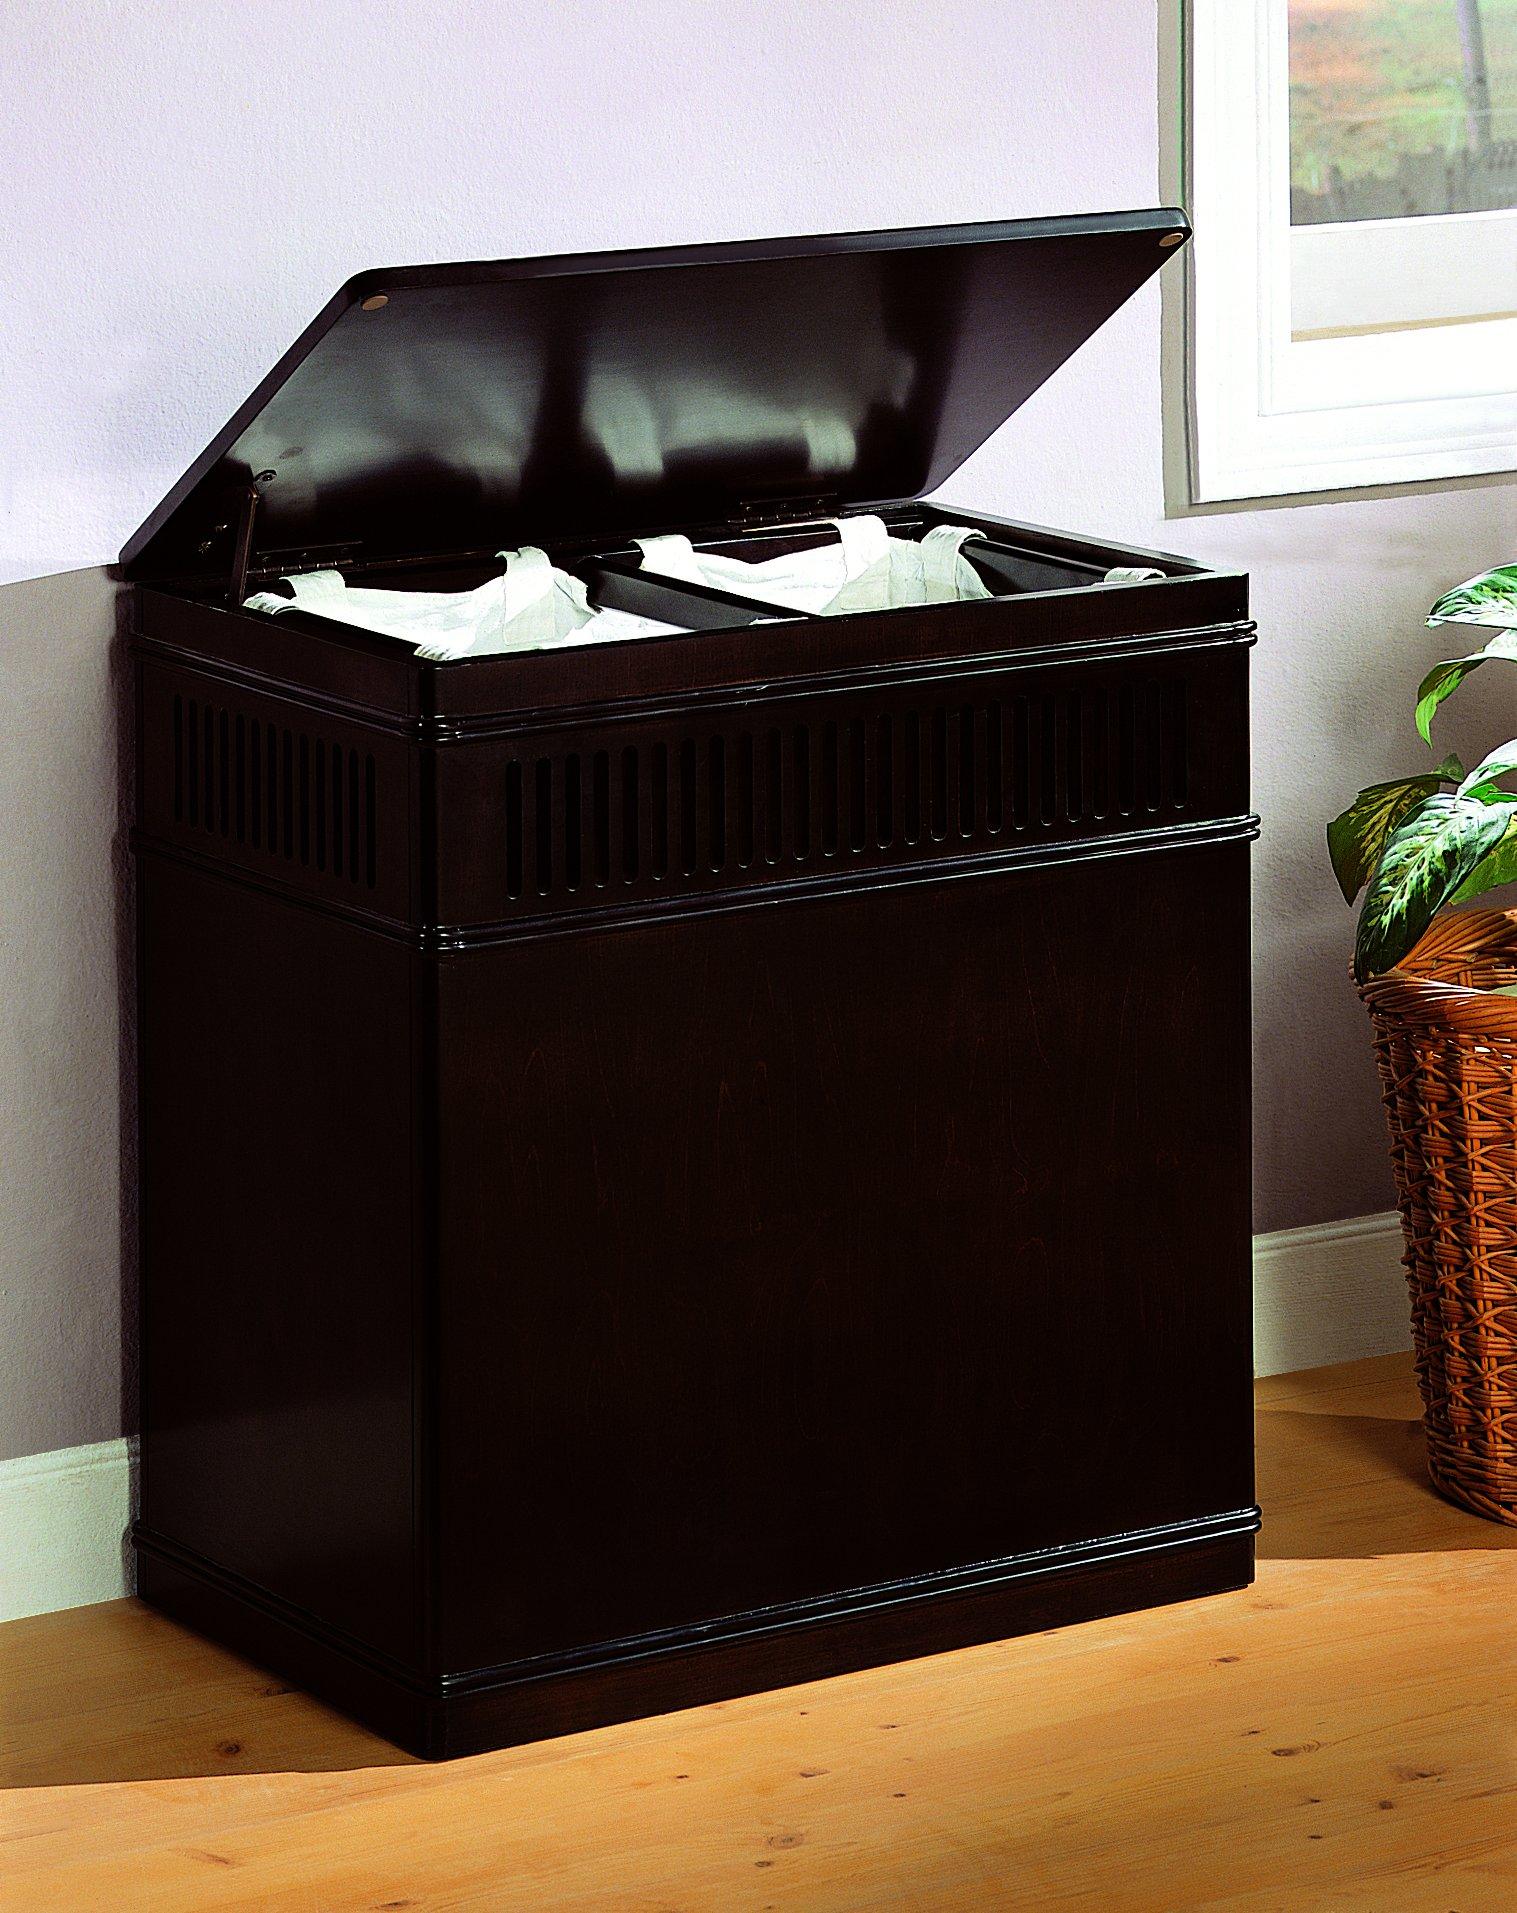 Coaster Home Furnishings Laundry Hamper, Cappuccino by Coaster Home Furnishings (Image #2)